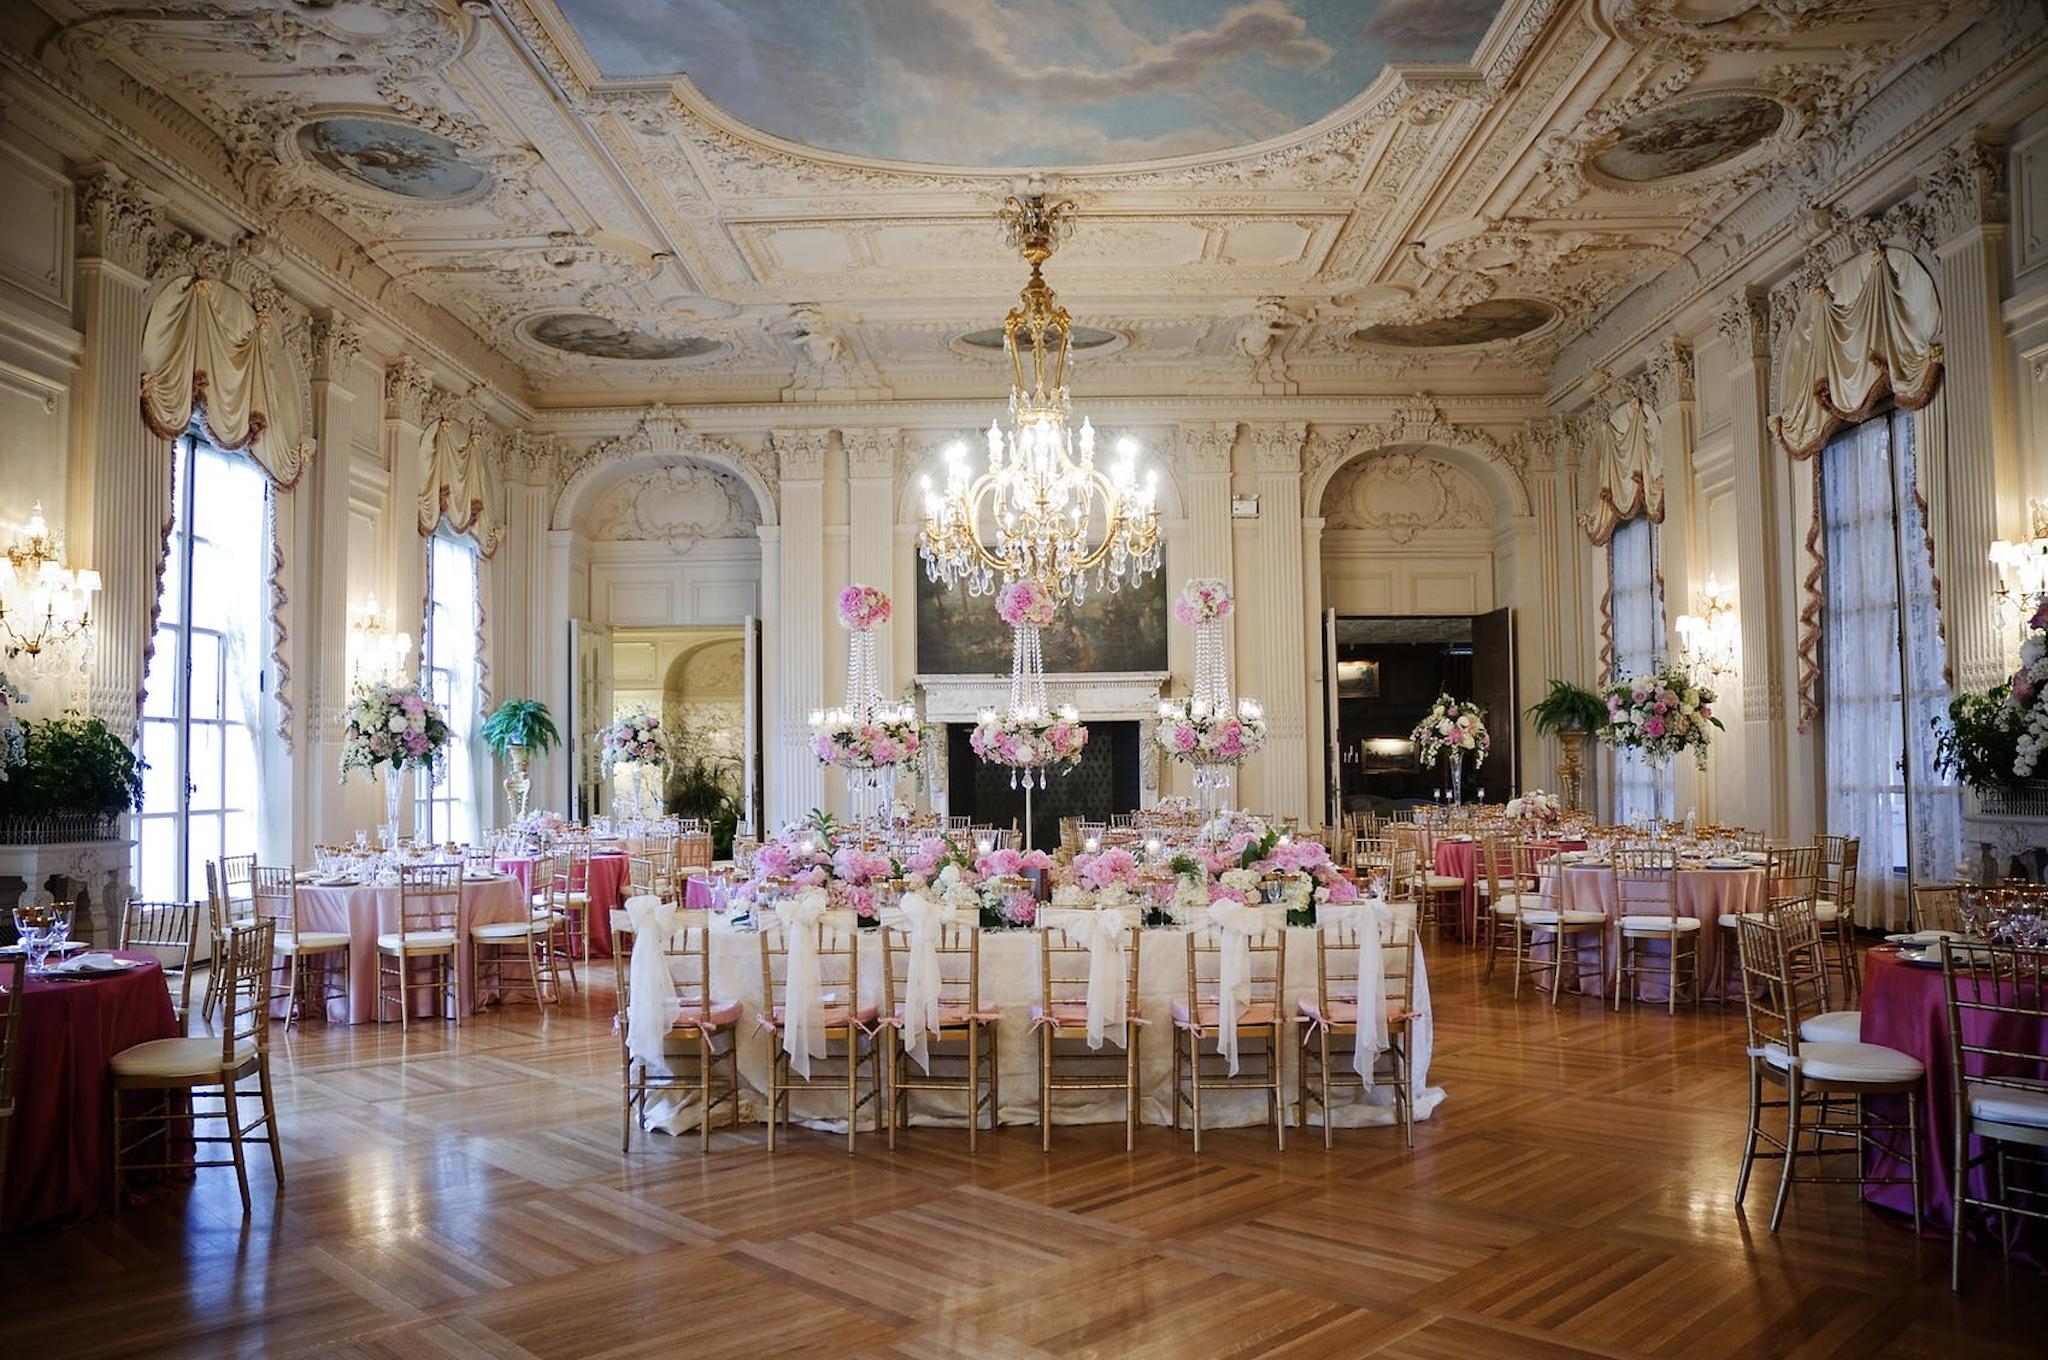 old fashioned ballroom